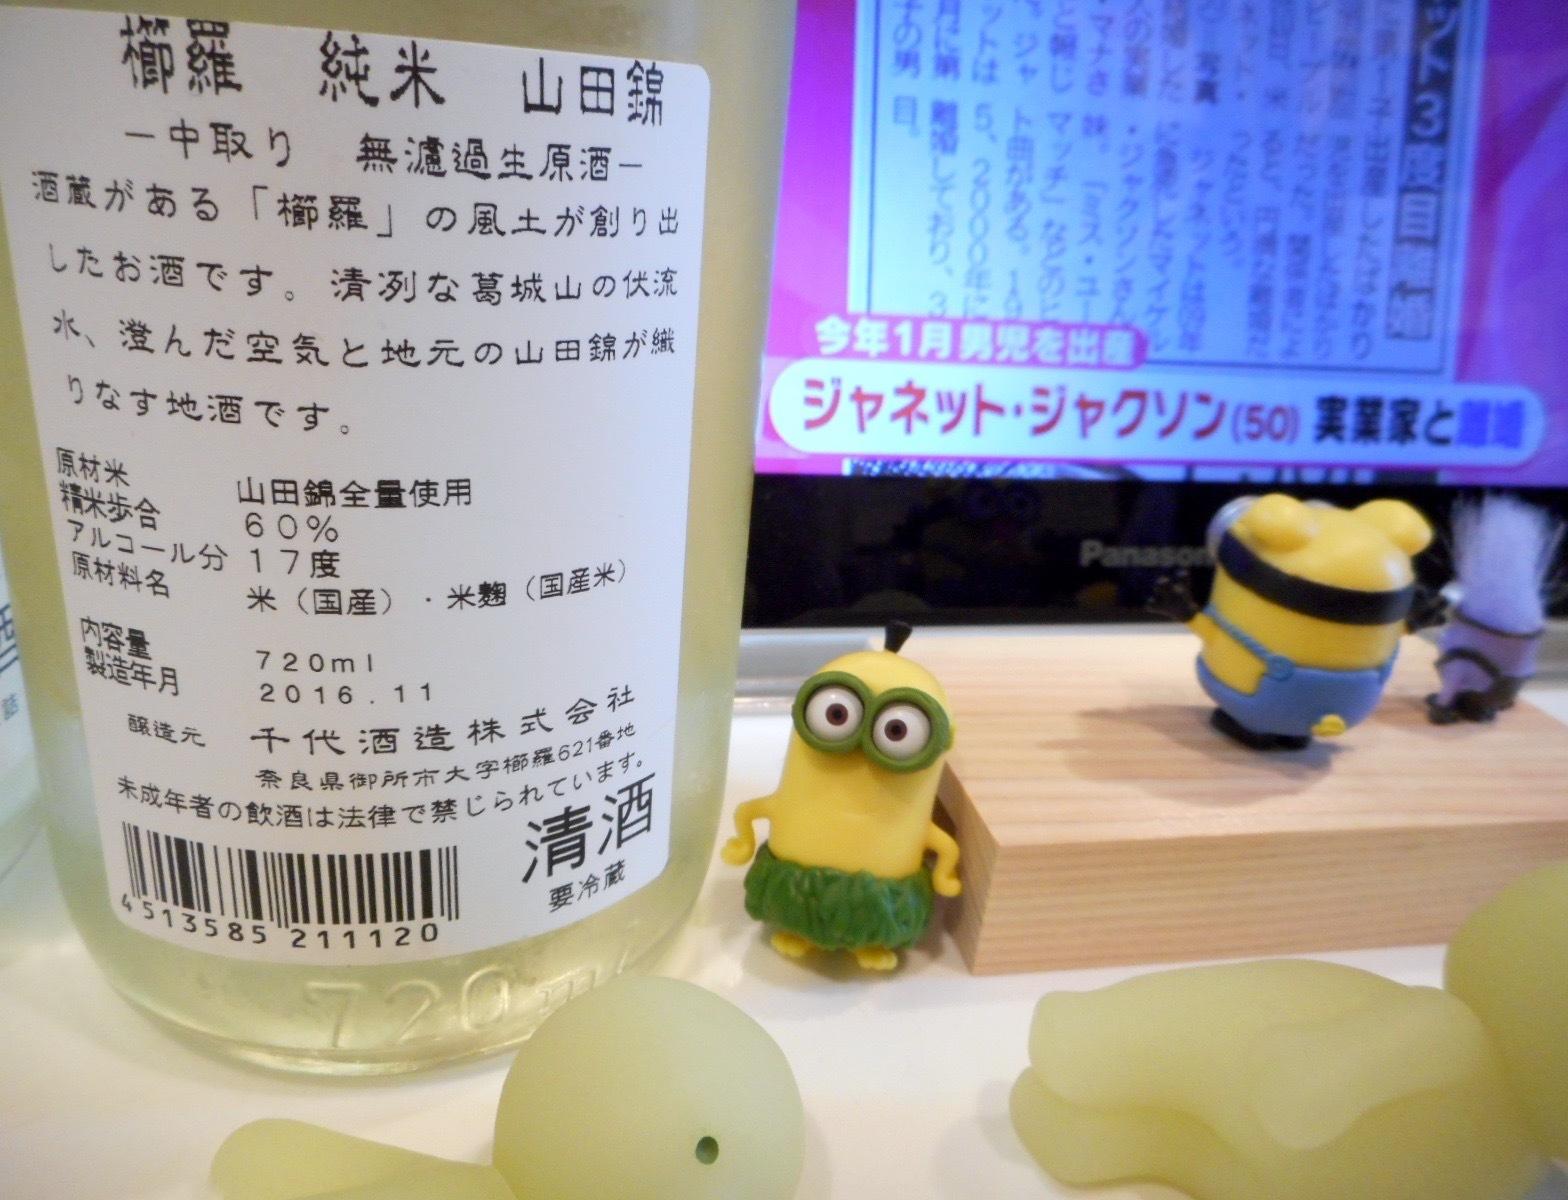 kujira_junmai_kodama27by2.jpg